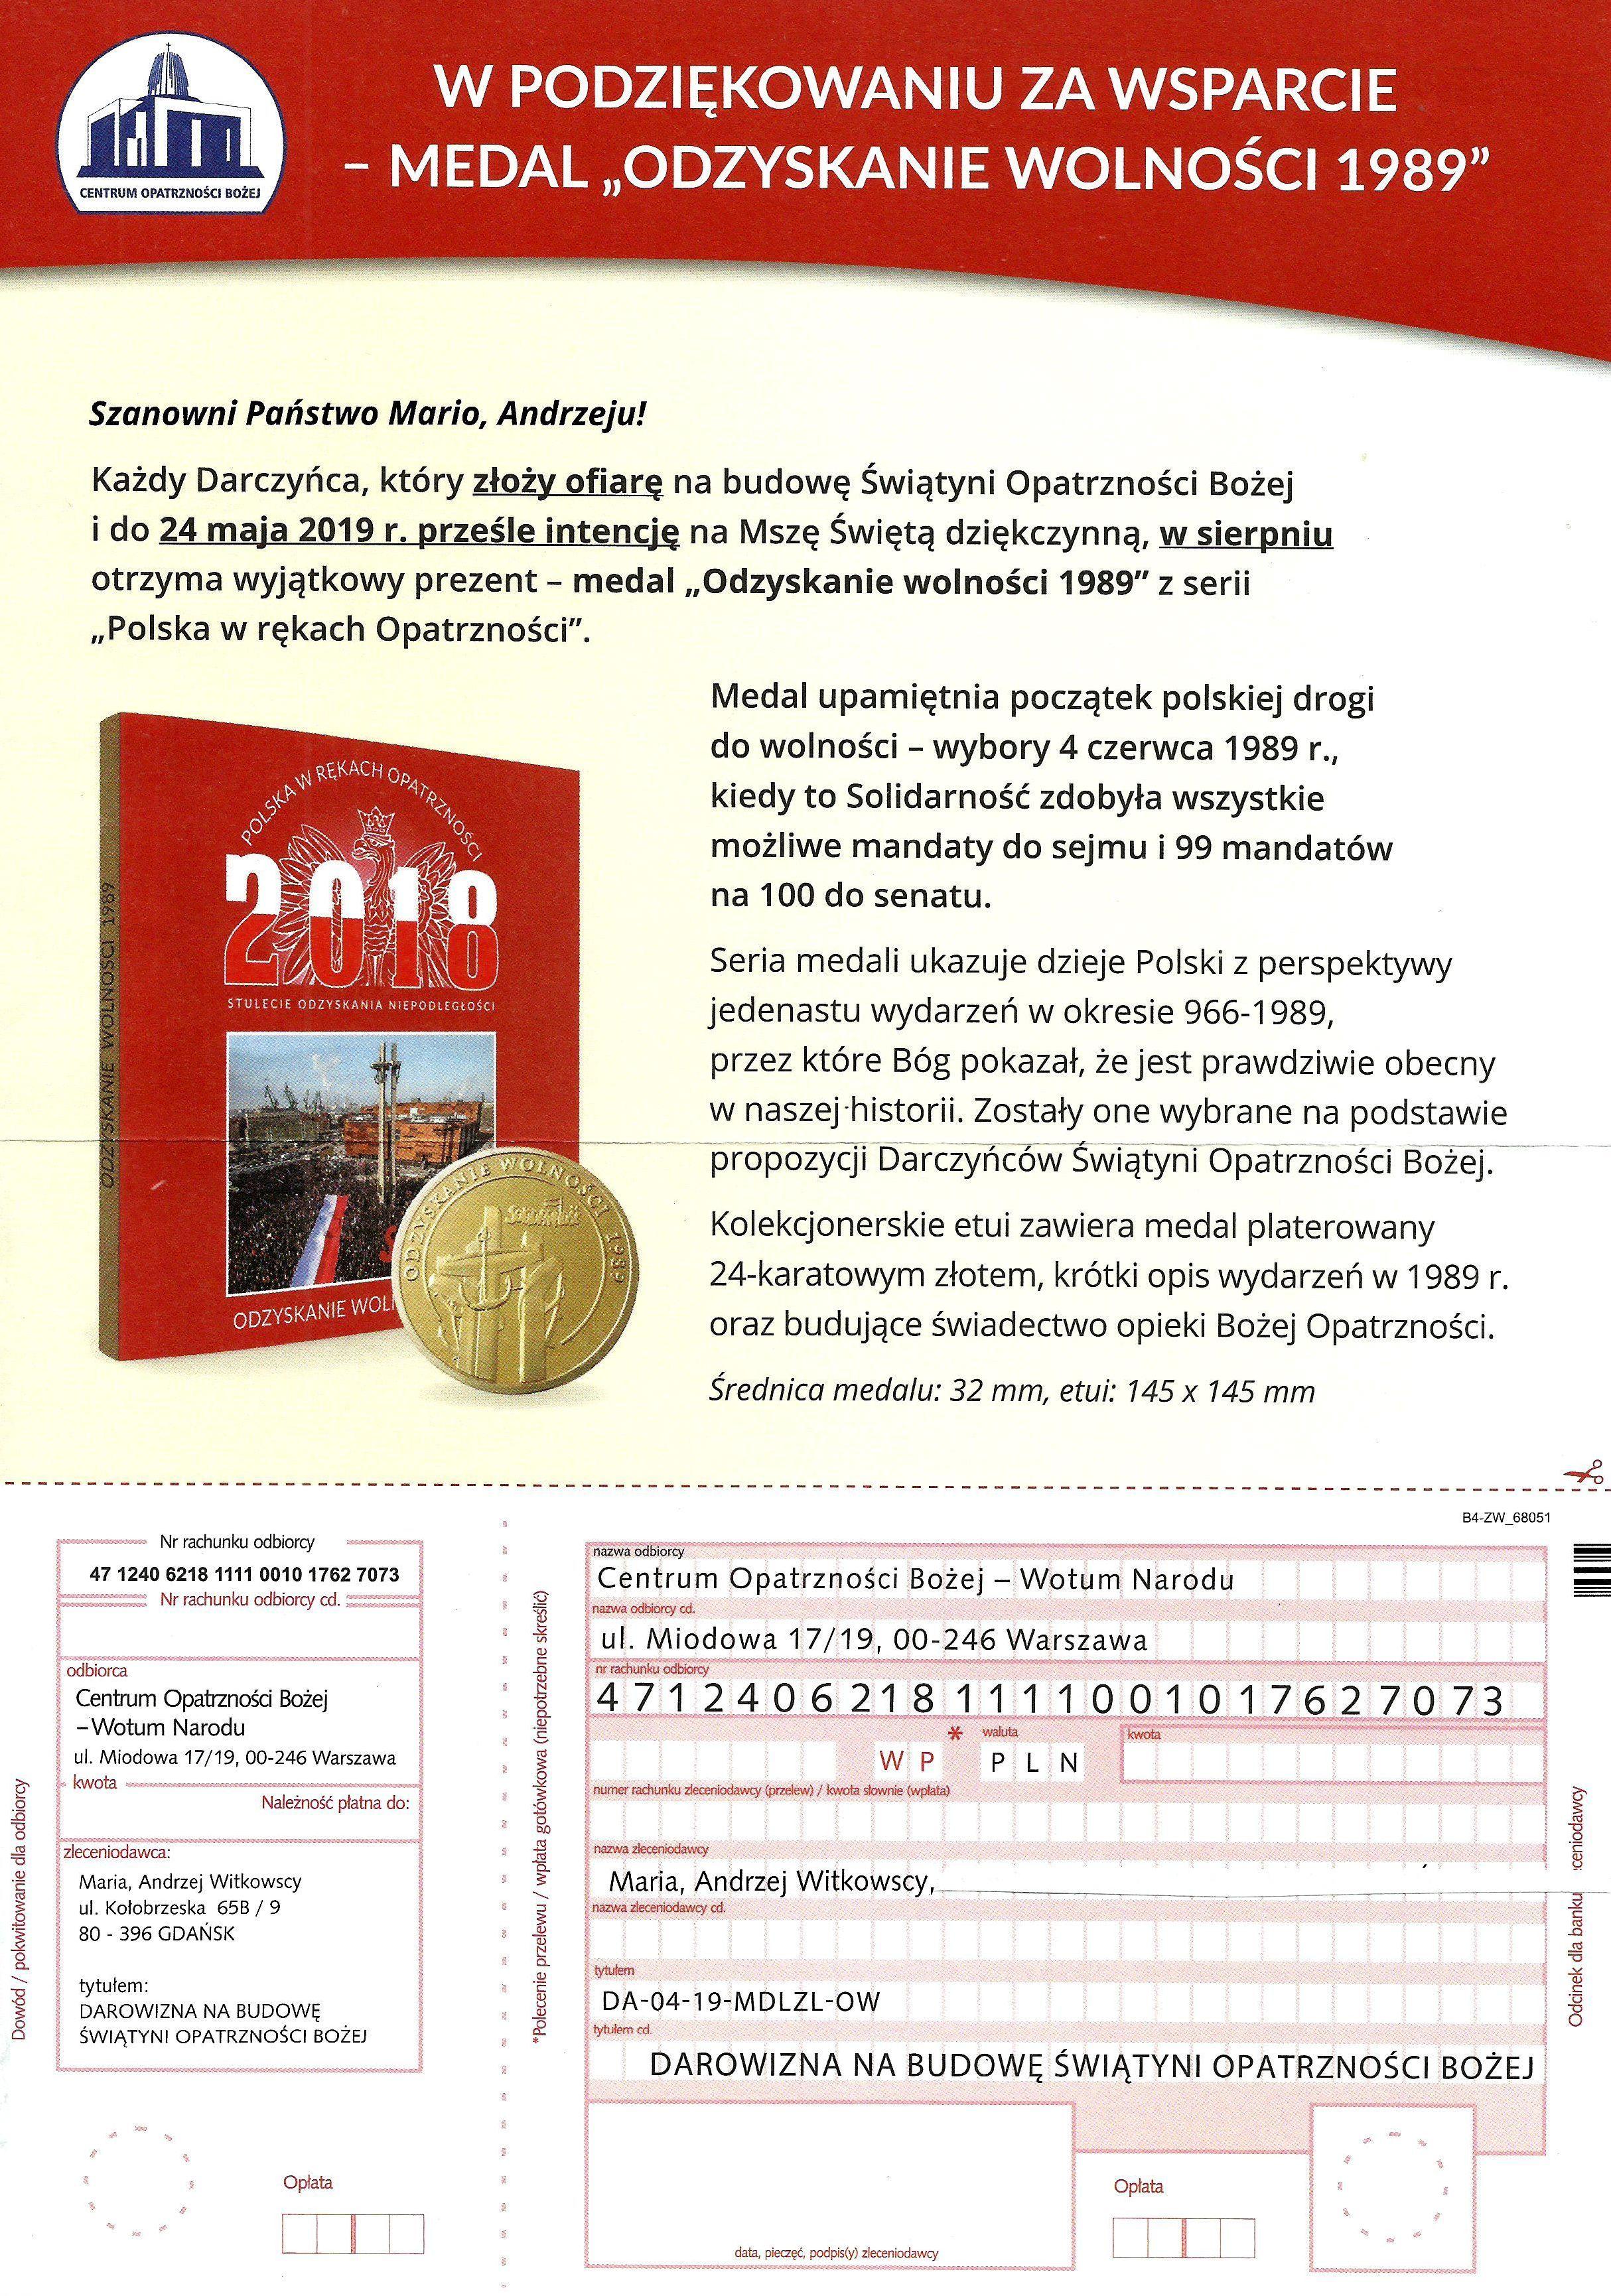 6. informacja o medalu